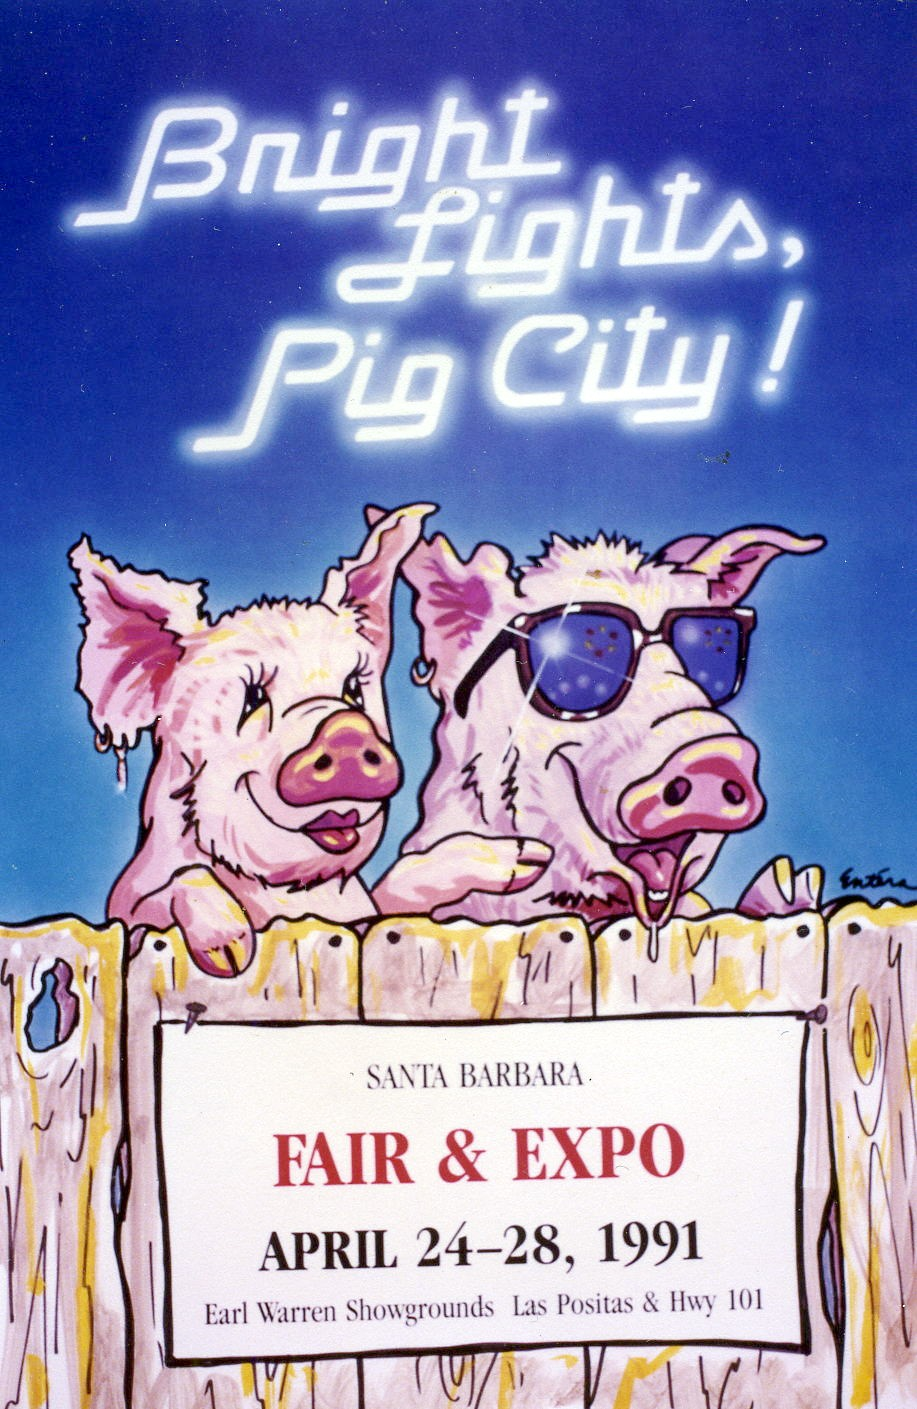 pig_city.jpg